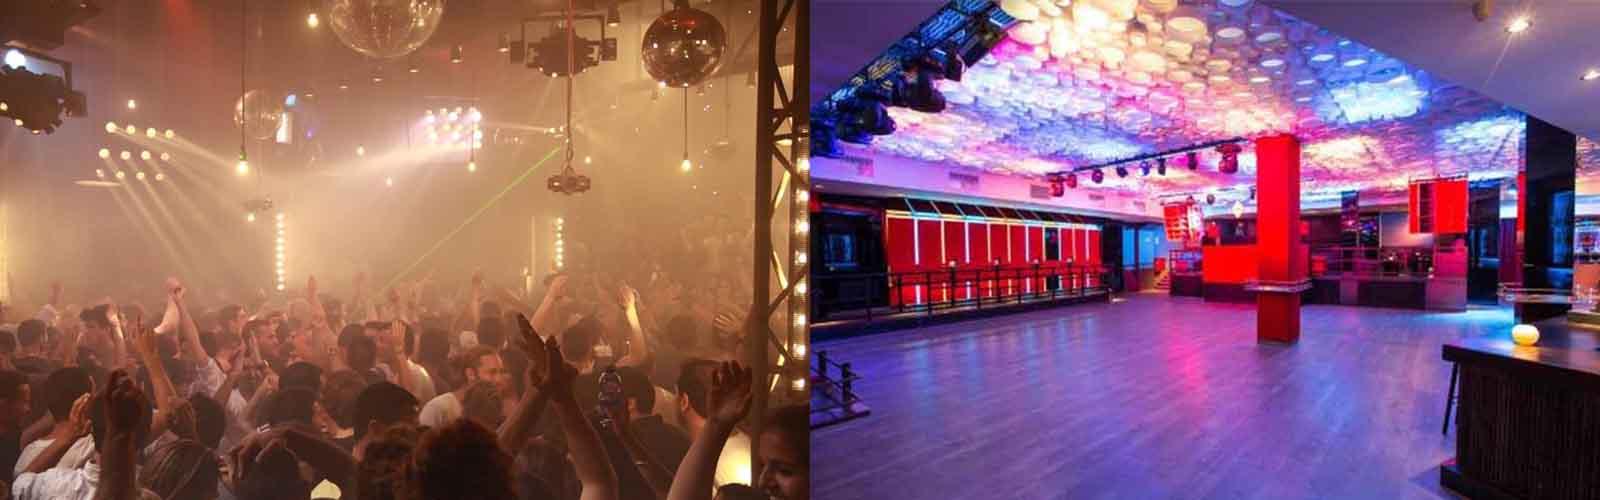 Party the Spanish way at Nightclub Sala Tango